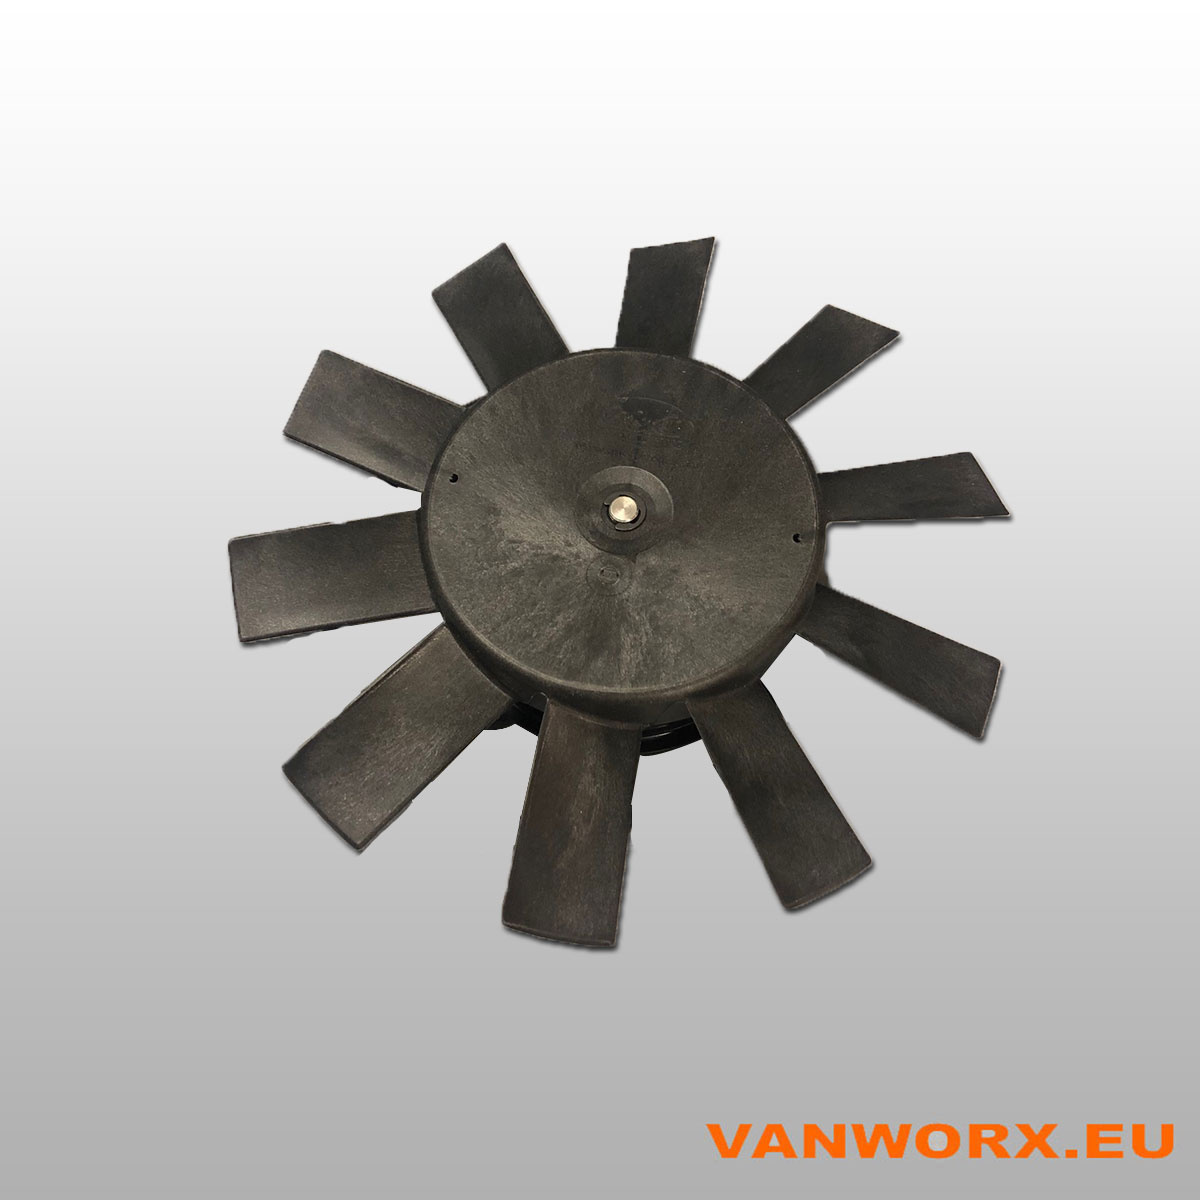 Ventilatorflügel/ blad